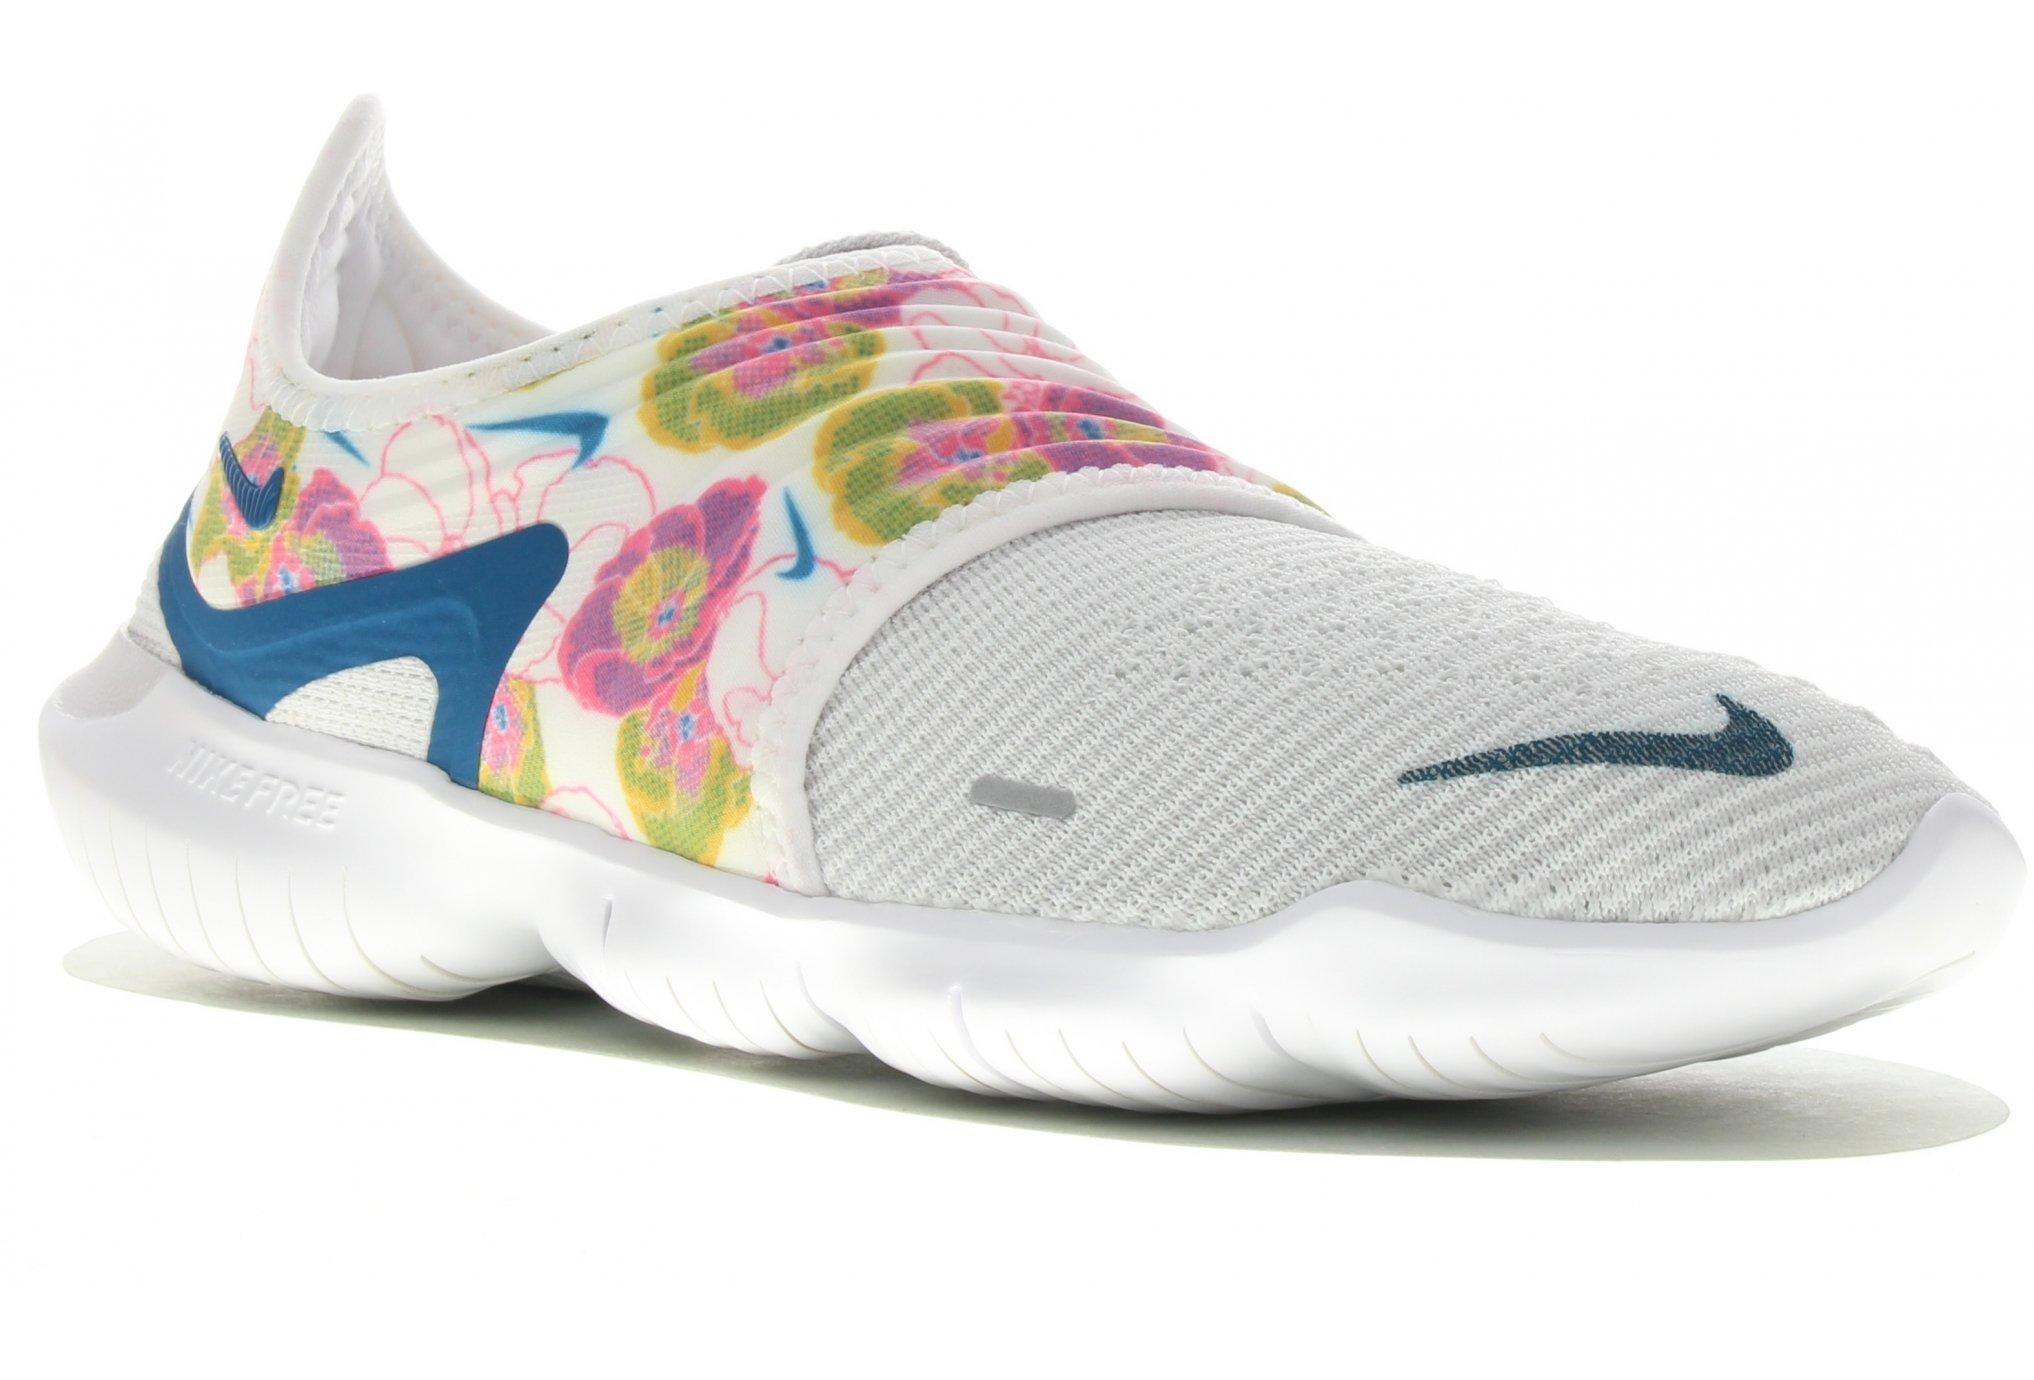 Nike Free RN Flyknit 3.0 FLR W Chaussures running femme